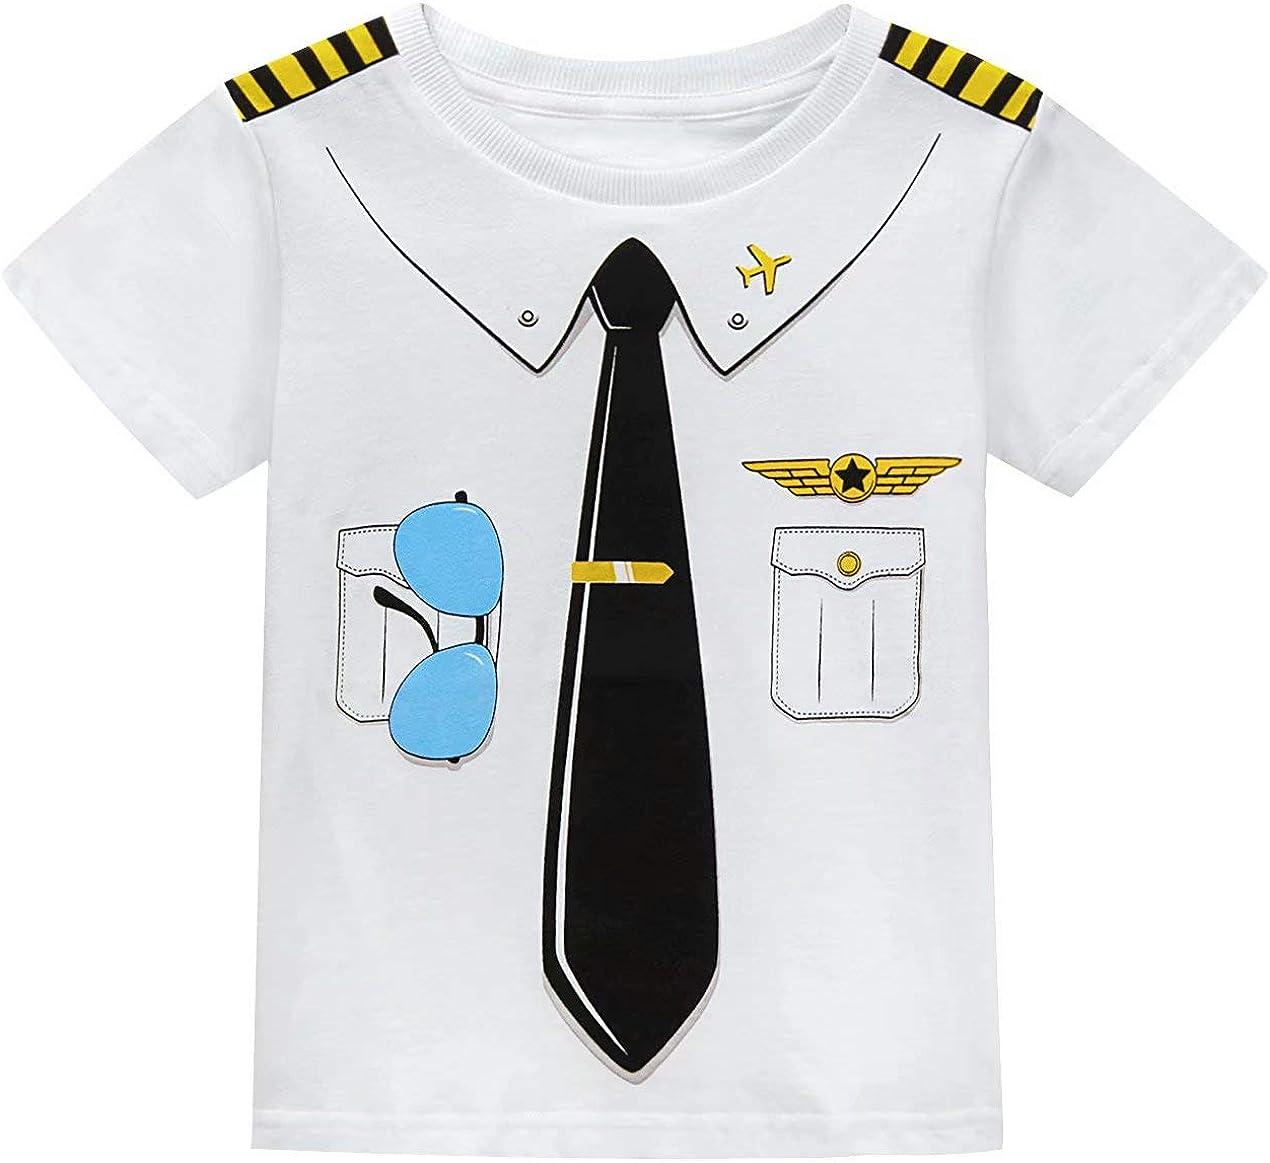 MOMBEBE COSLAND Disfraz para Beb/é Ni/ños Camiseta Estampada Manga Corta